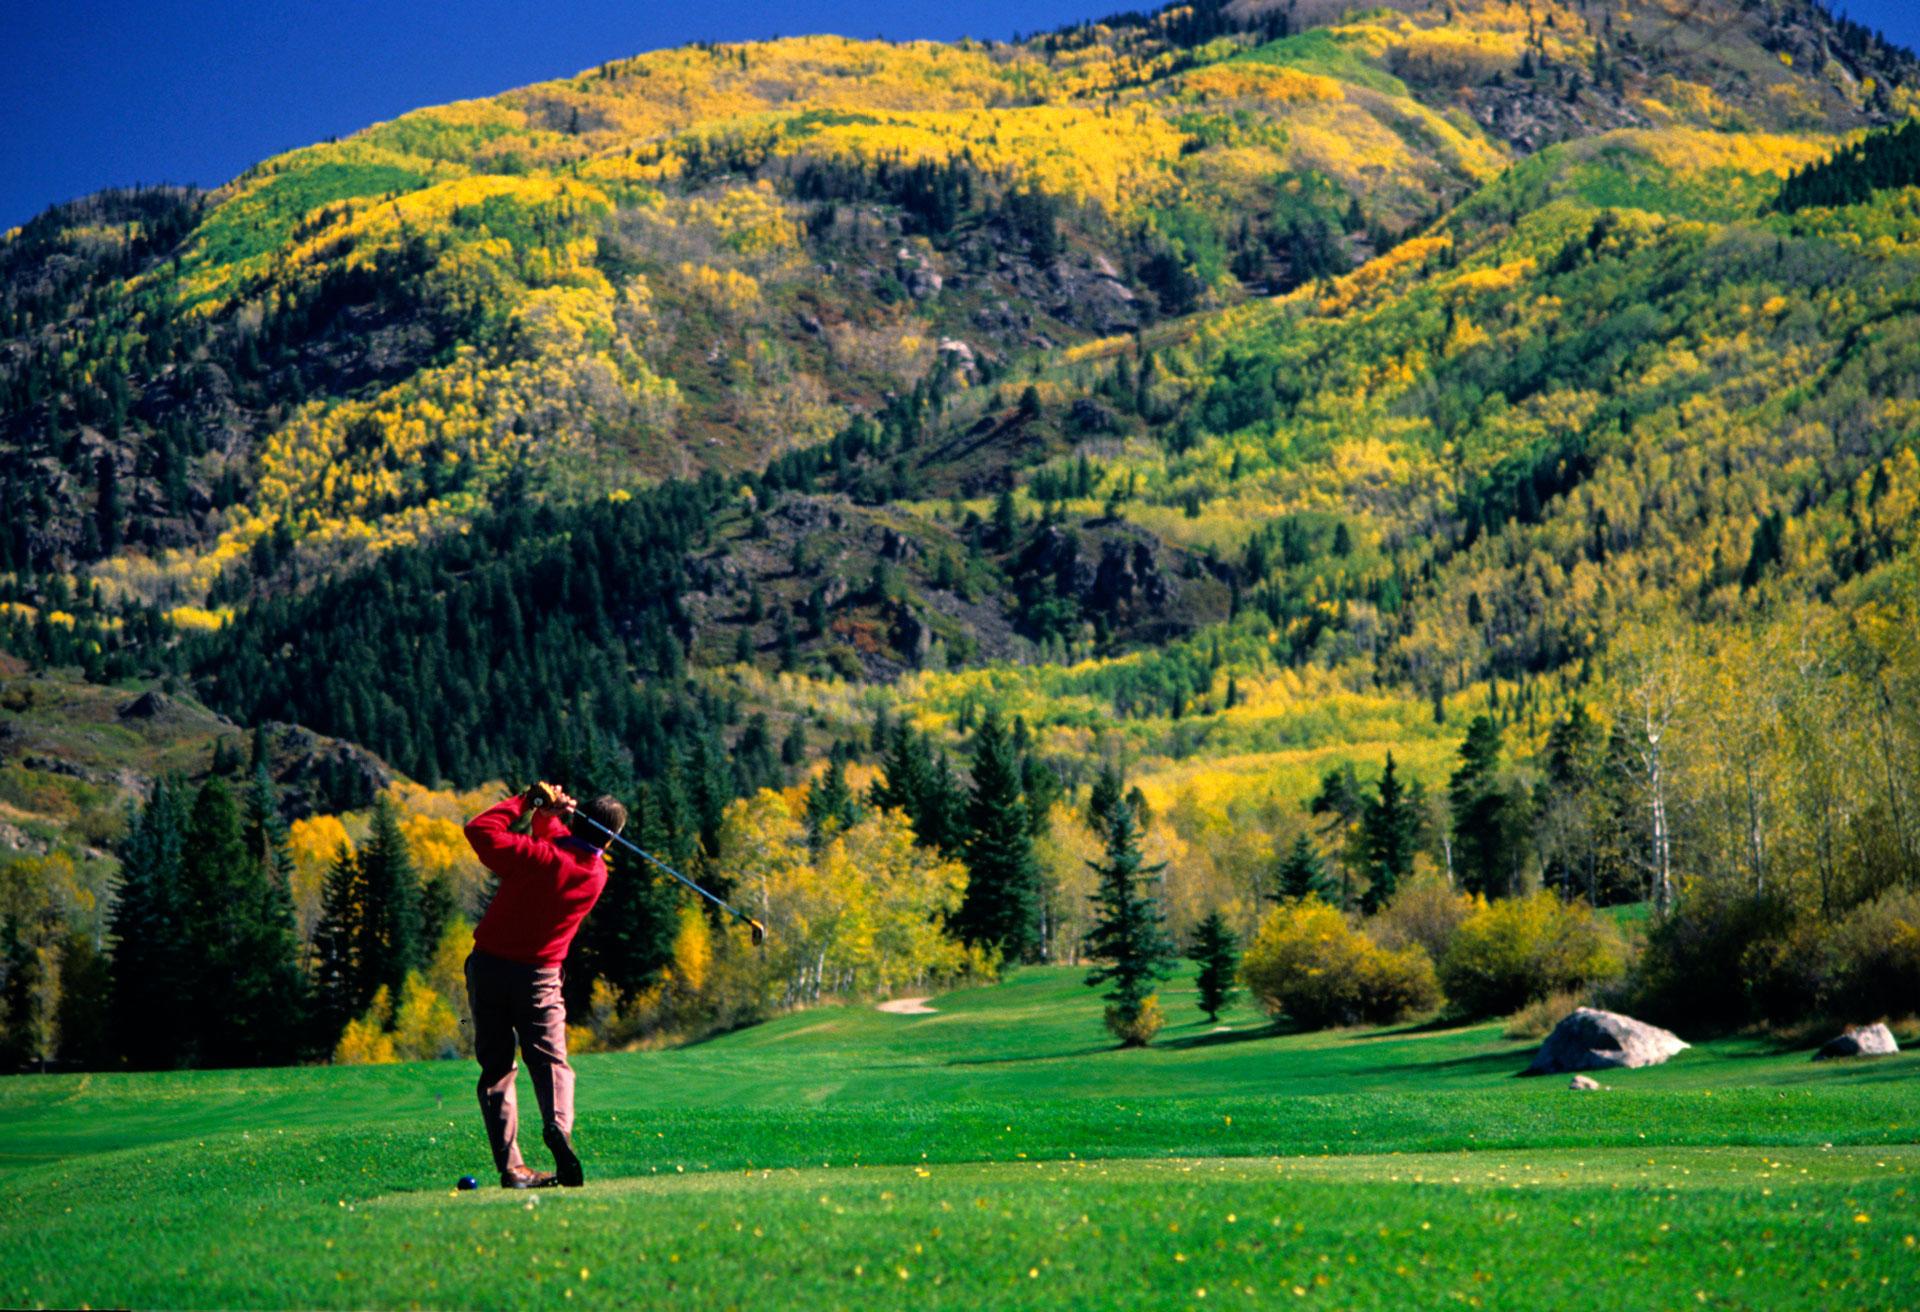 Fall Golf 4